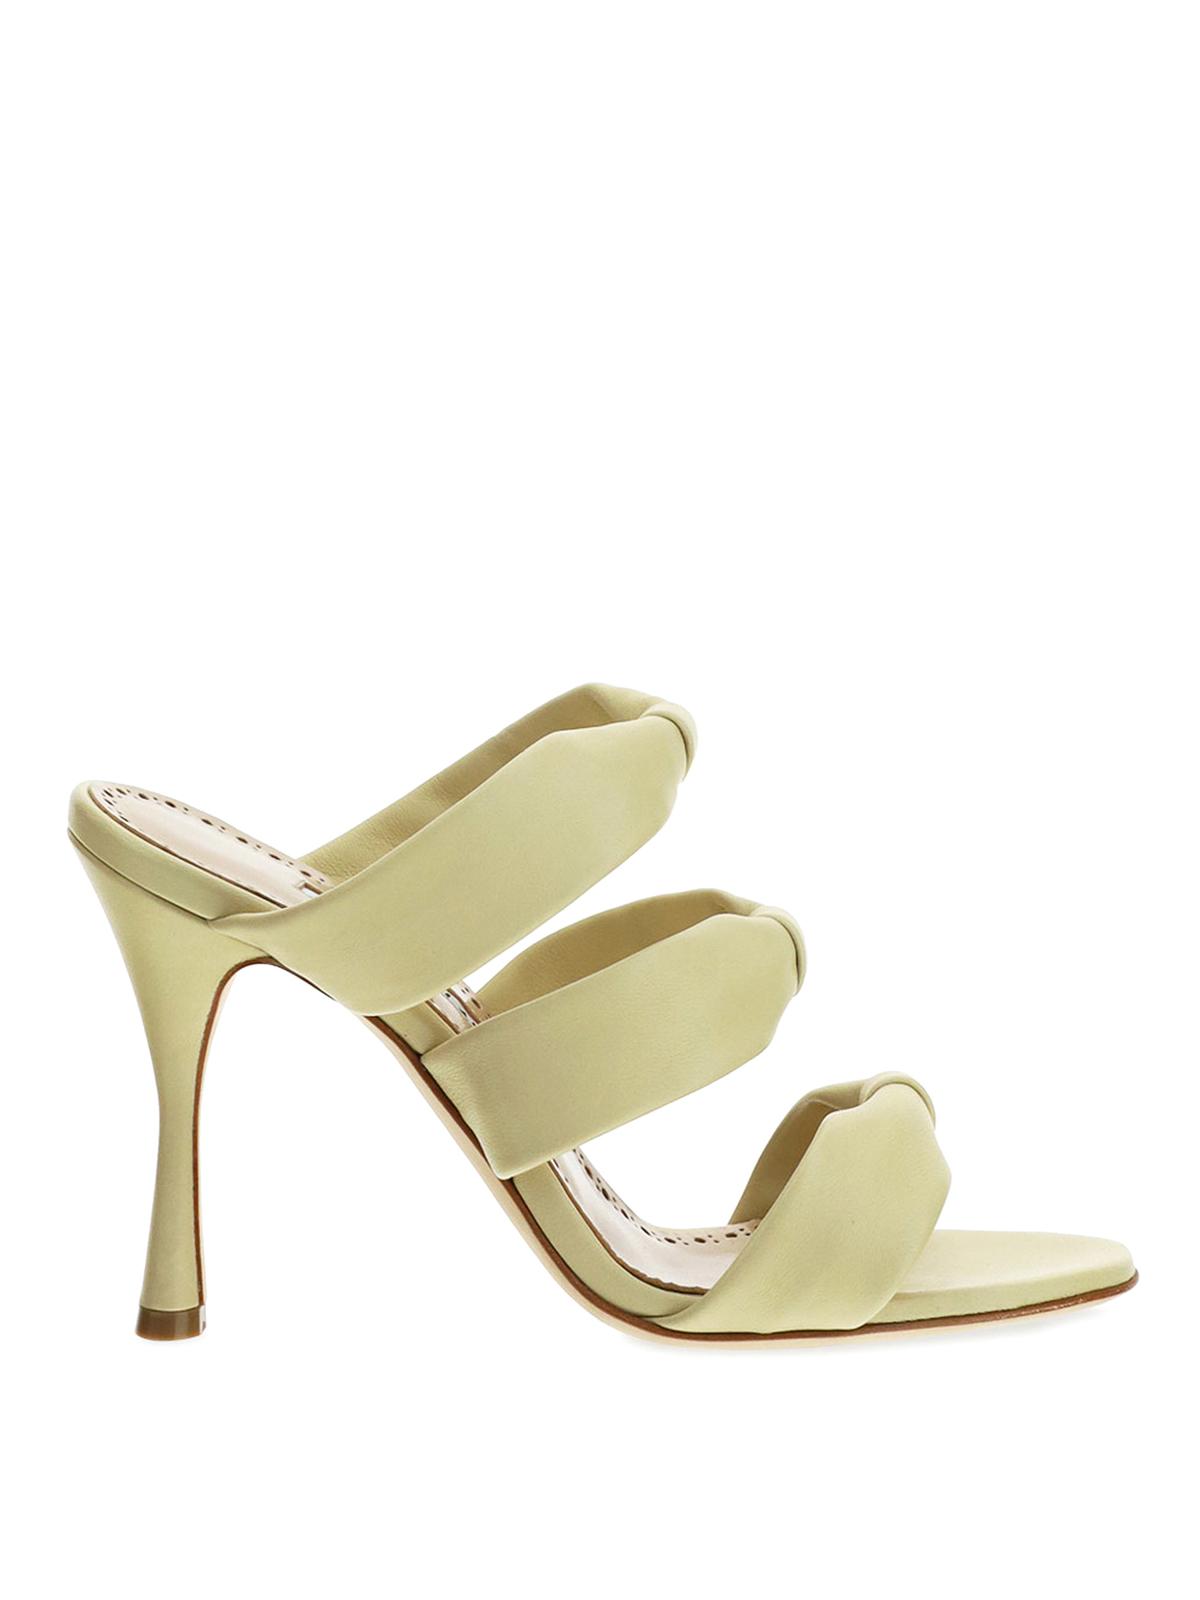 Manolo Blahnik High heels GYRICA SANDALS